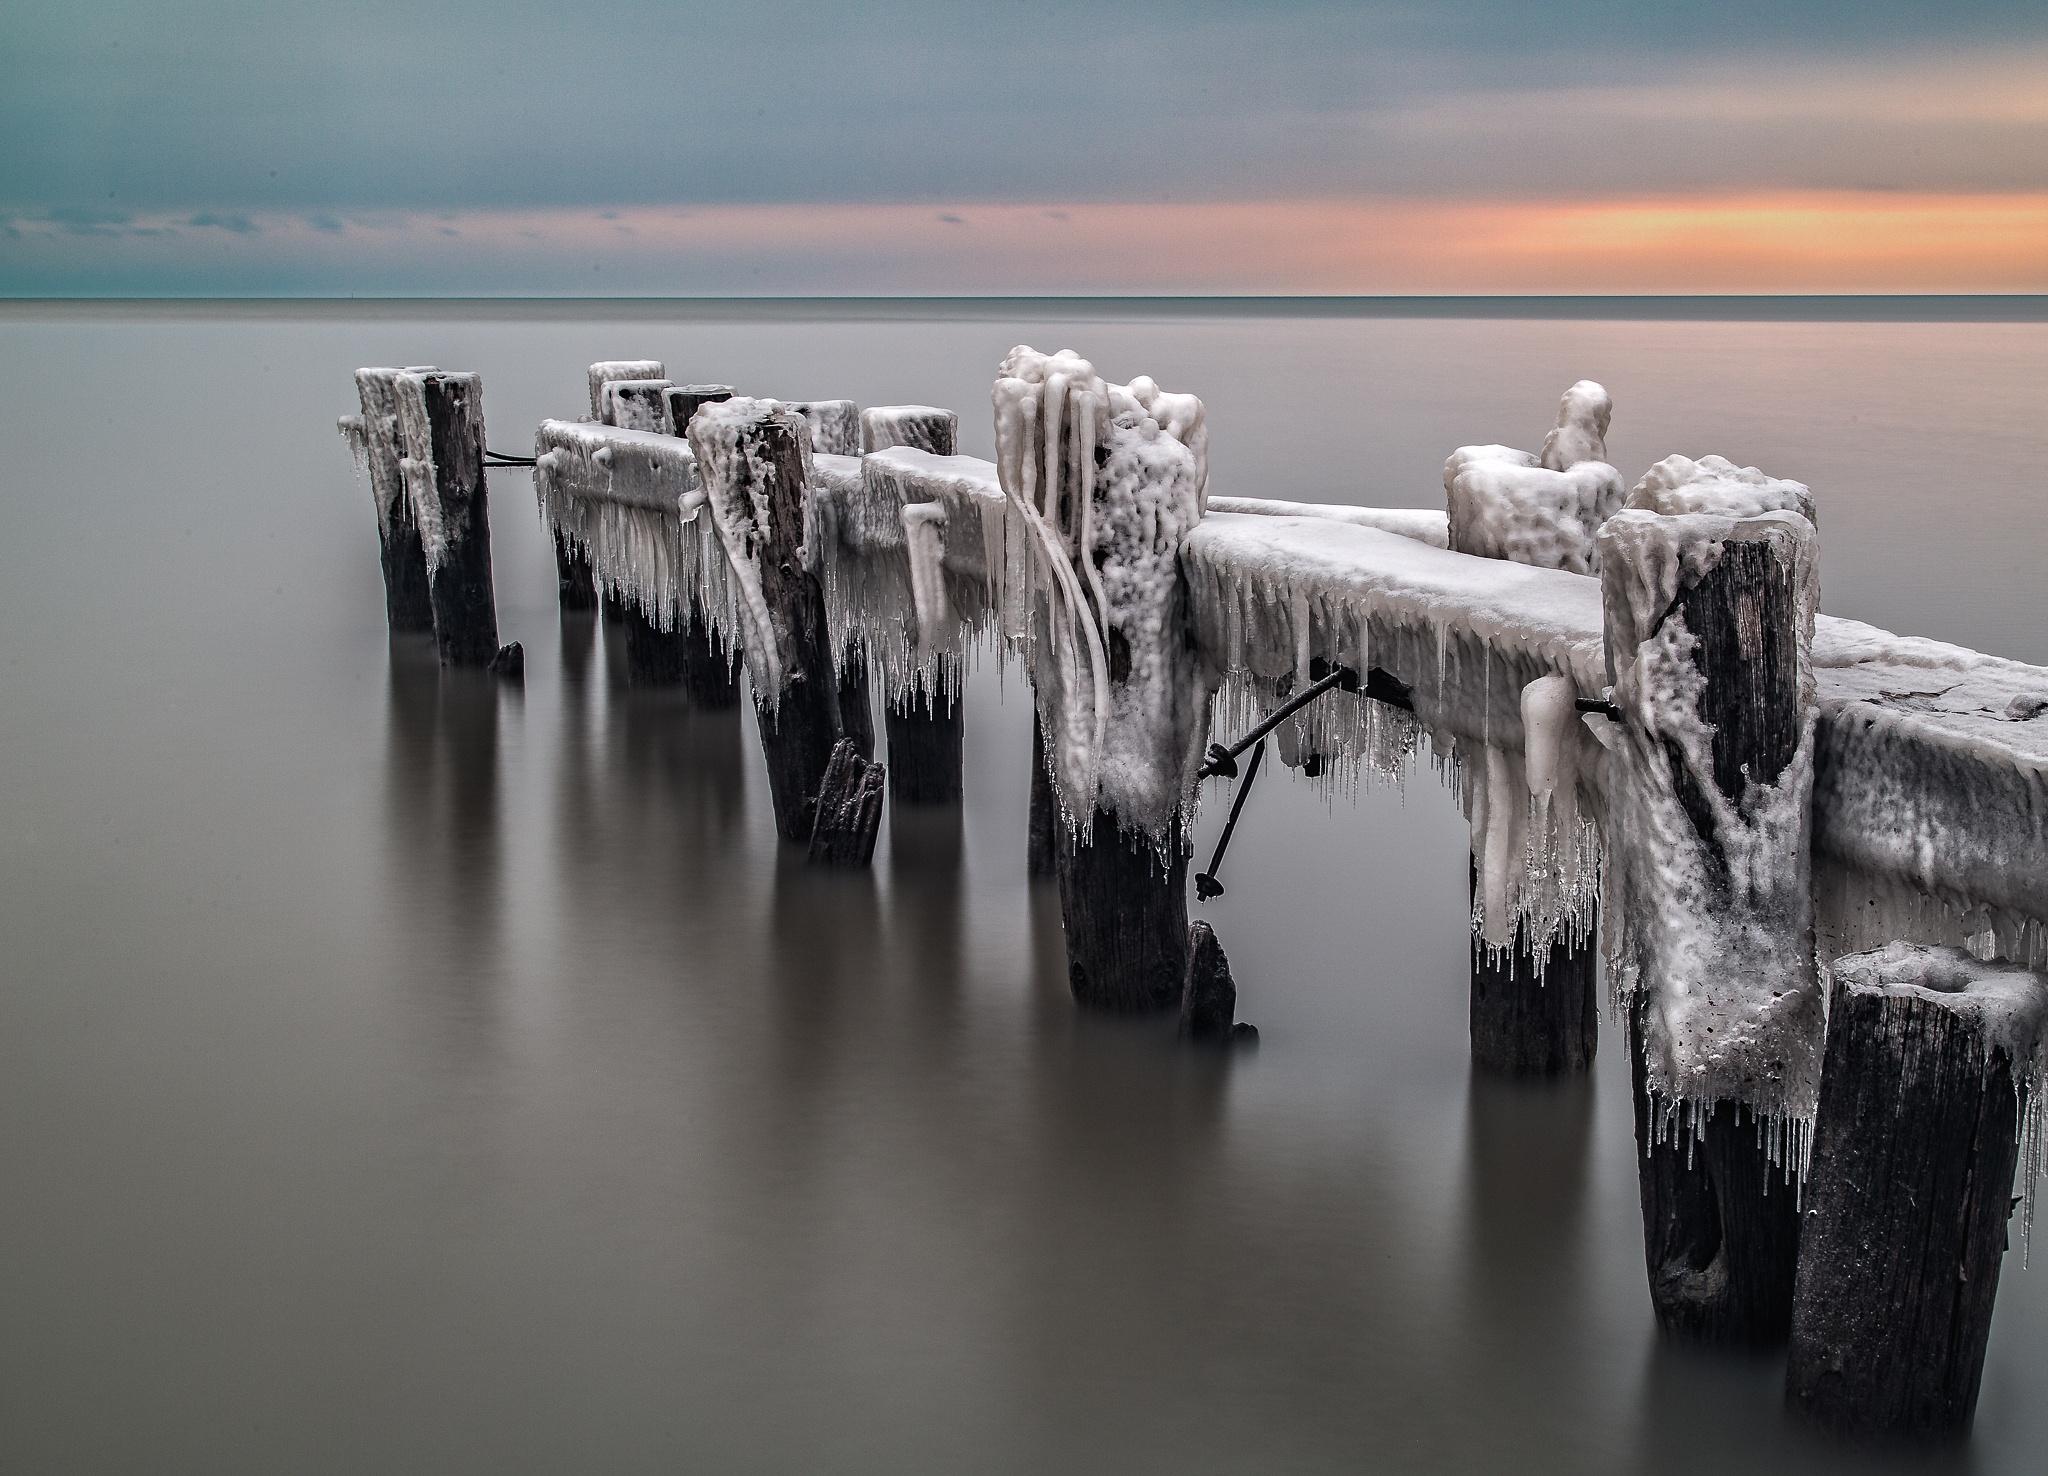 A Muted Sunrise by Paul Berkloo